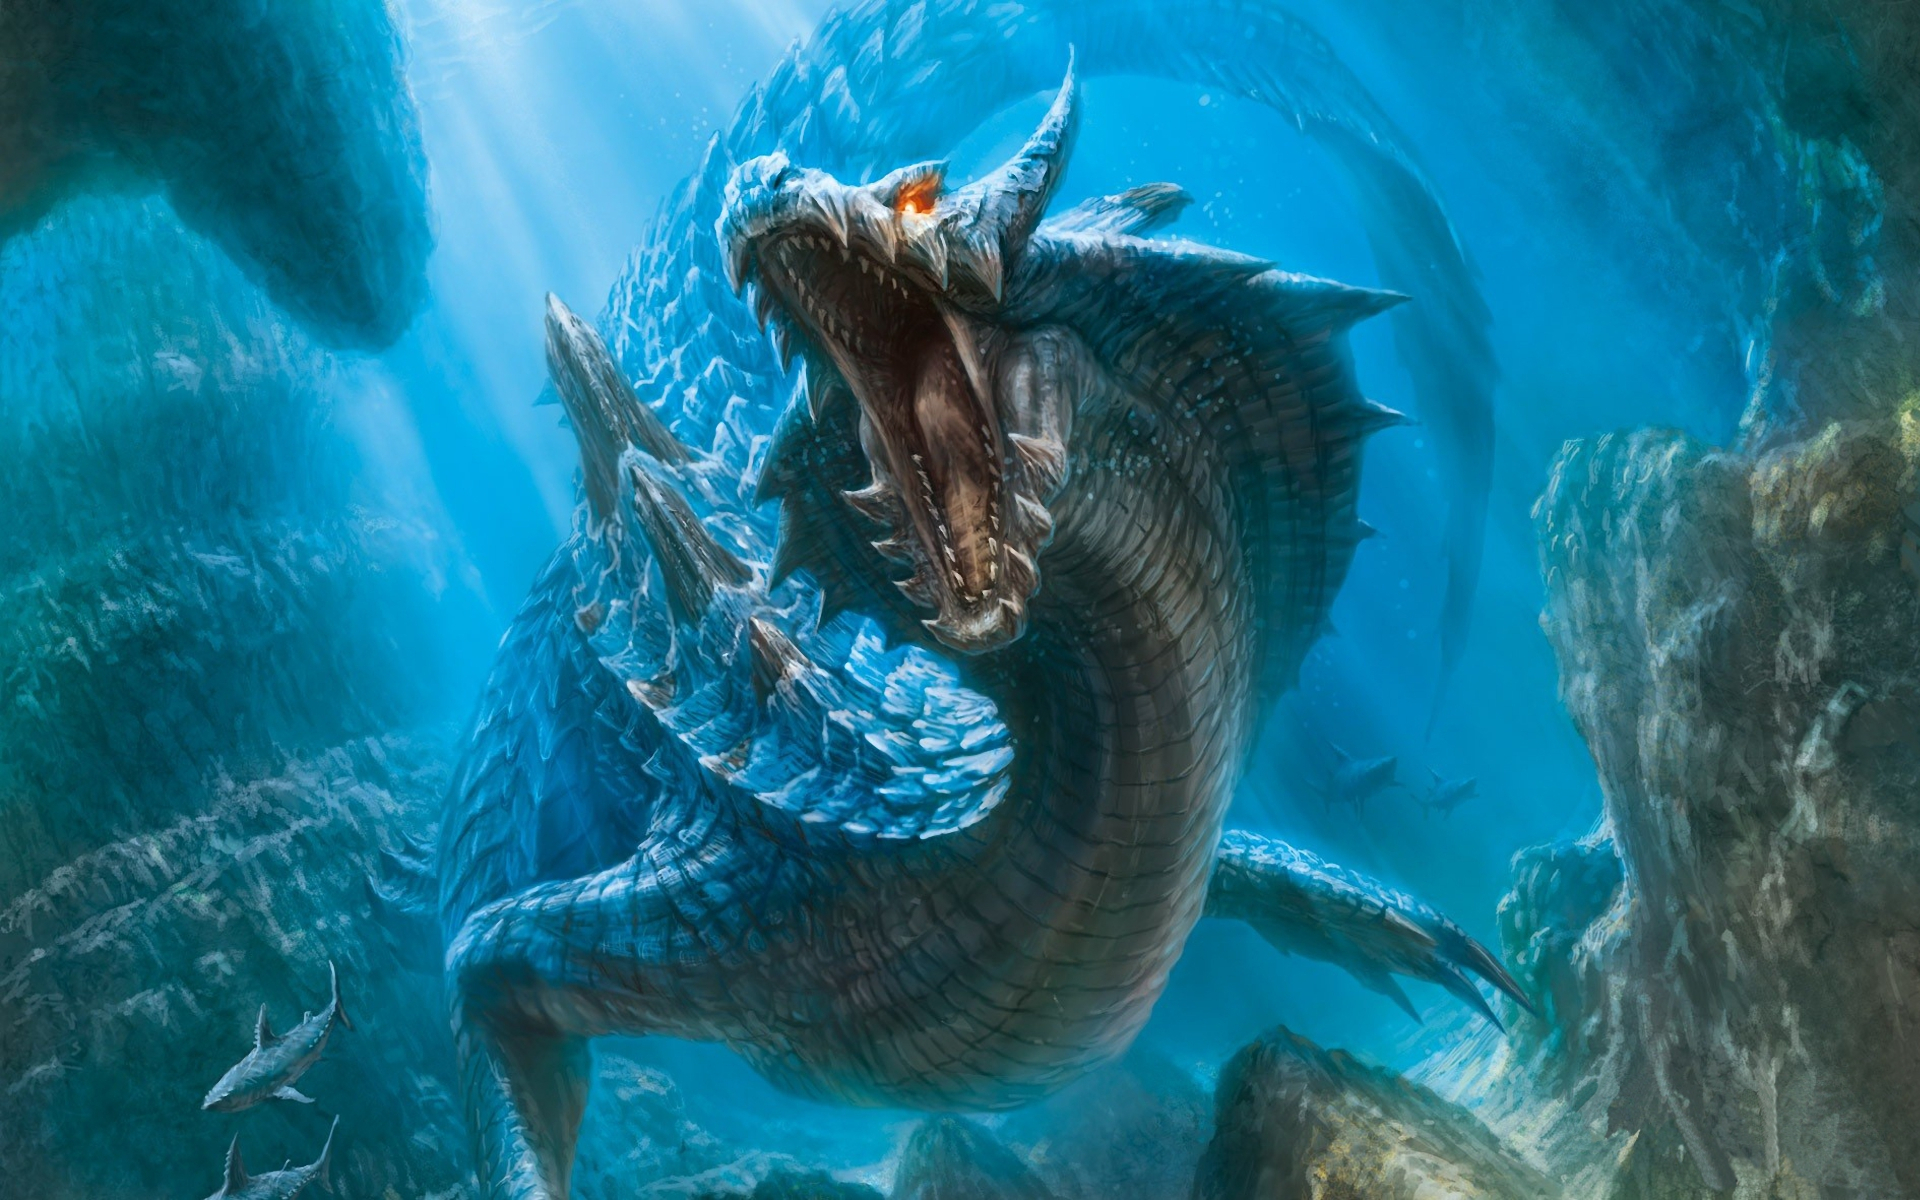 Fantasy water creatures - photo#23